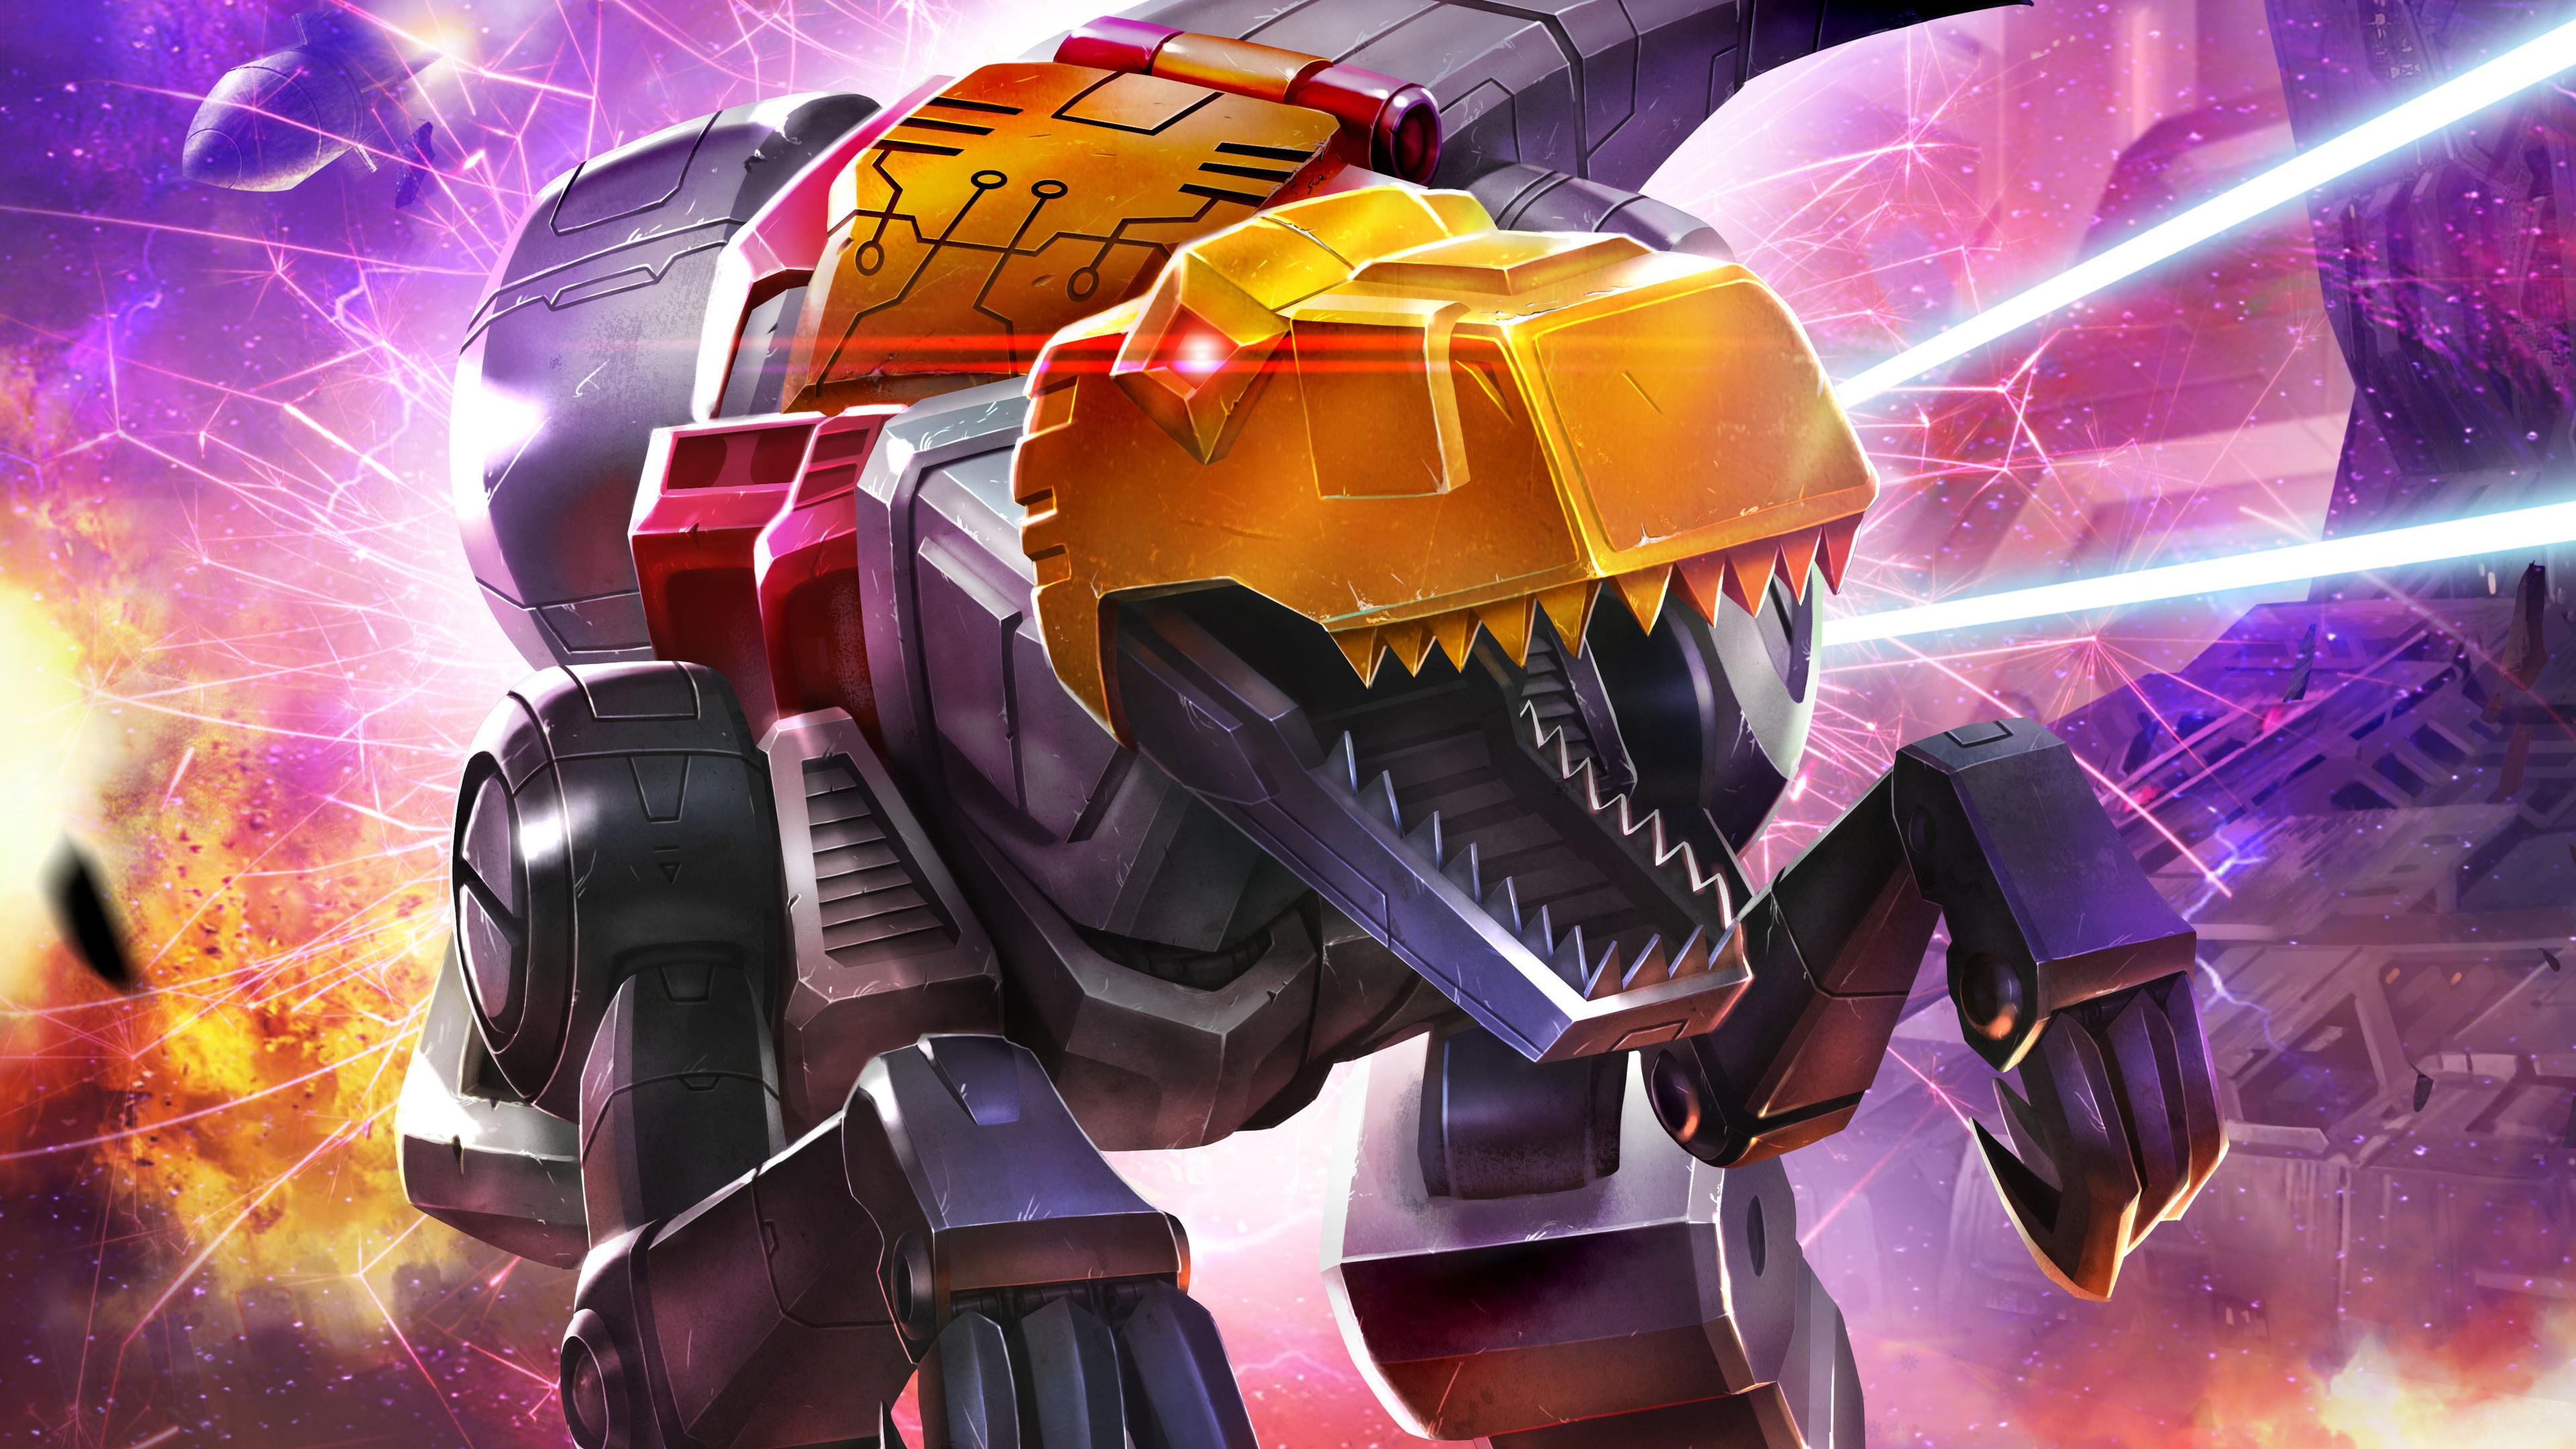 dinobots transformers art 1541294286 - Dinobots Transformers Art - transformers wallpapers, superheroes wallpapers, hd-wallpapers, artwork wallpapers, 4k-wallpapers